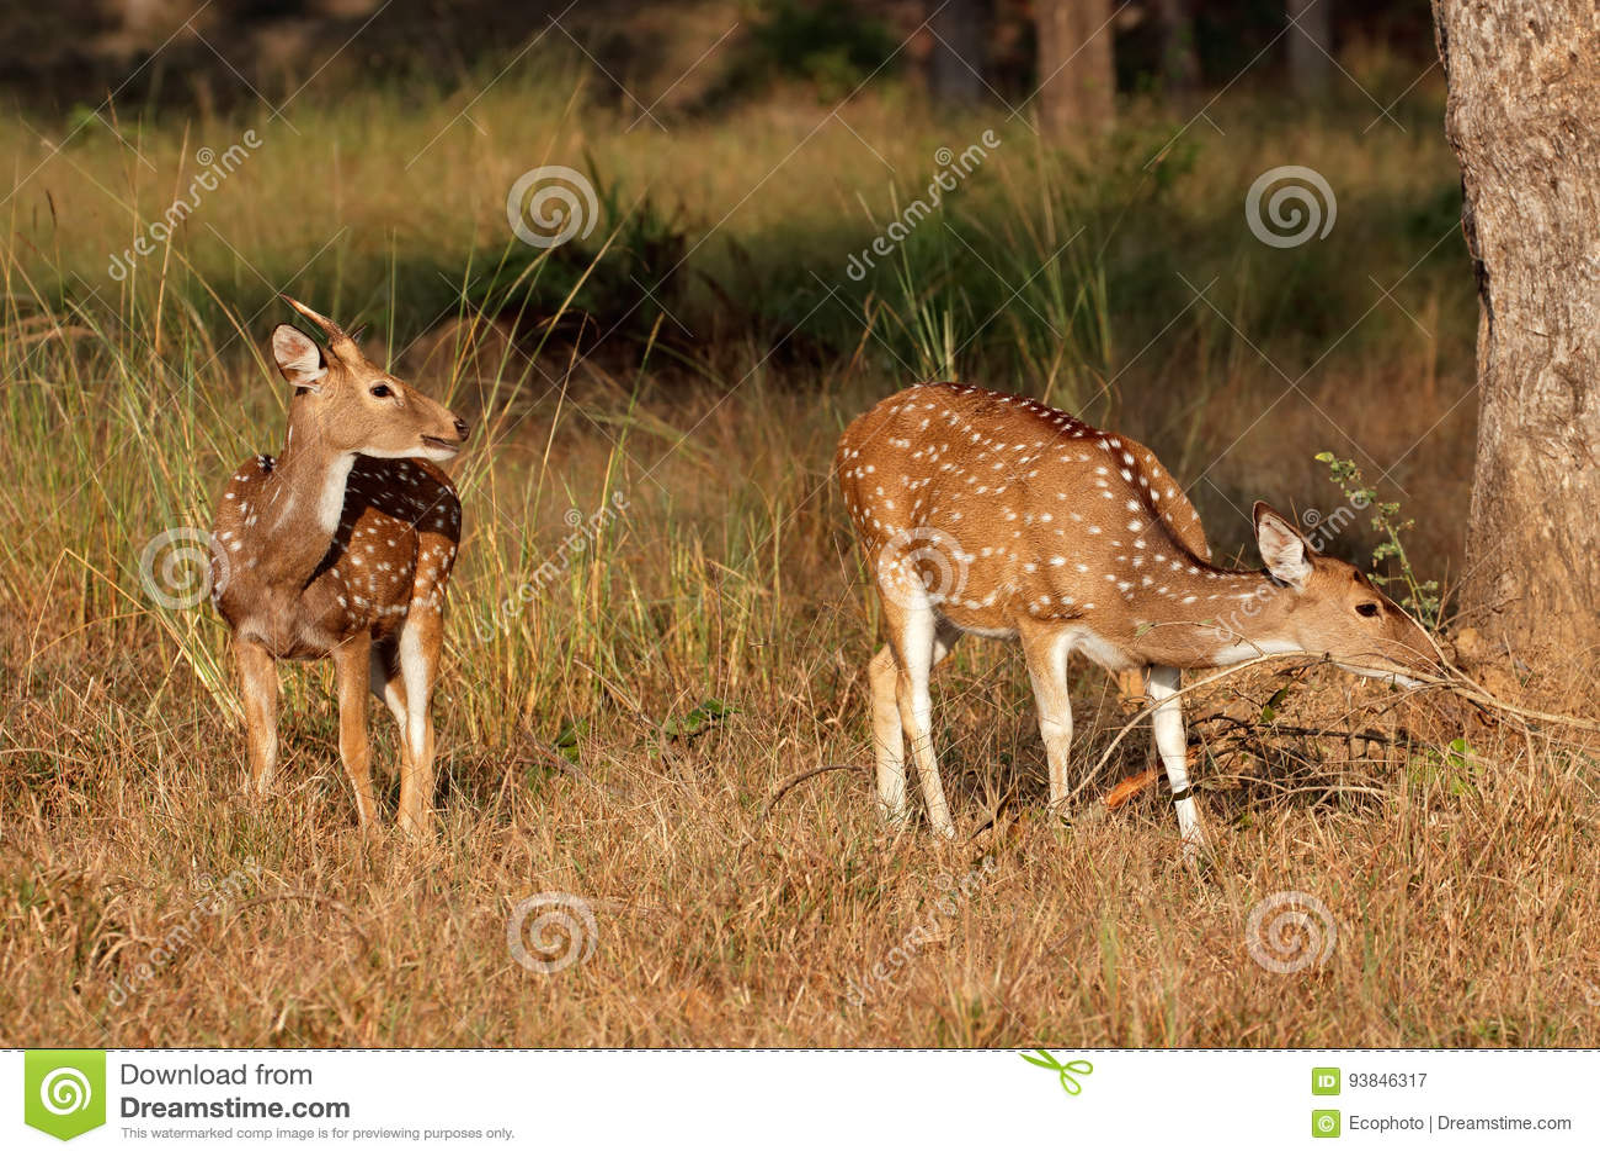 Spotted Deer In Natural Habitat Stock Image